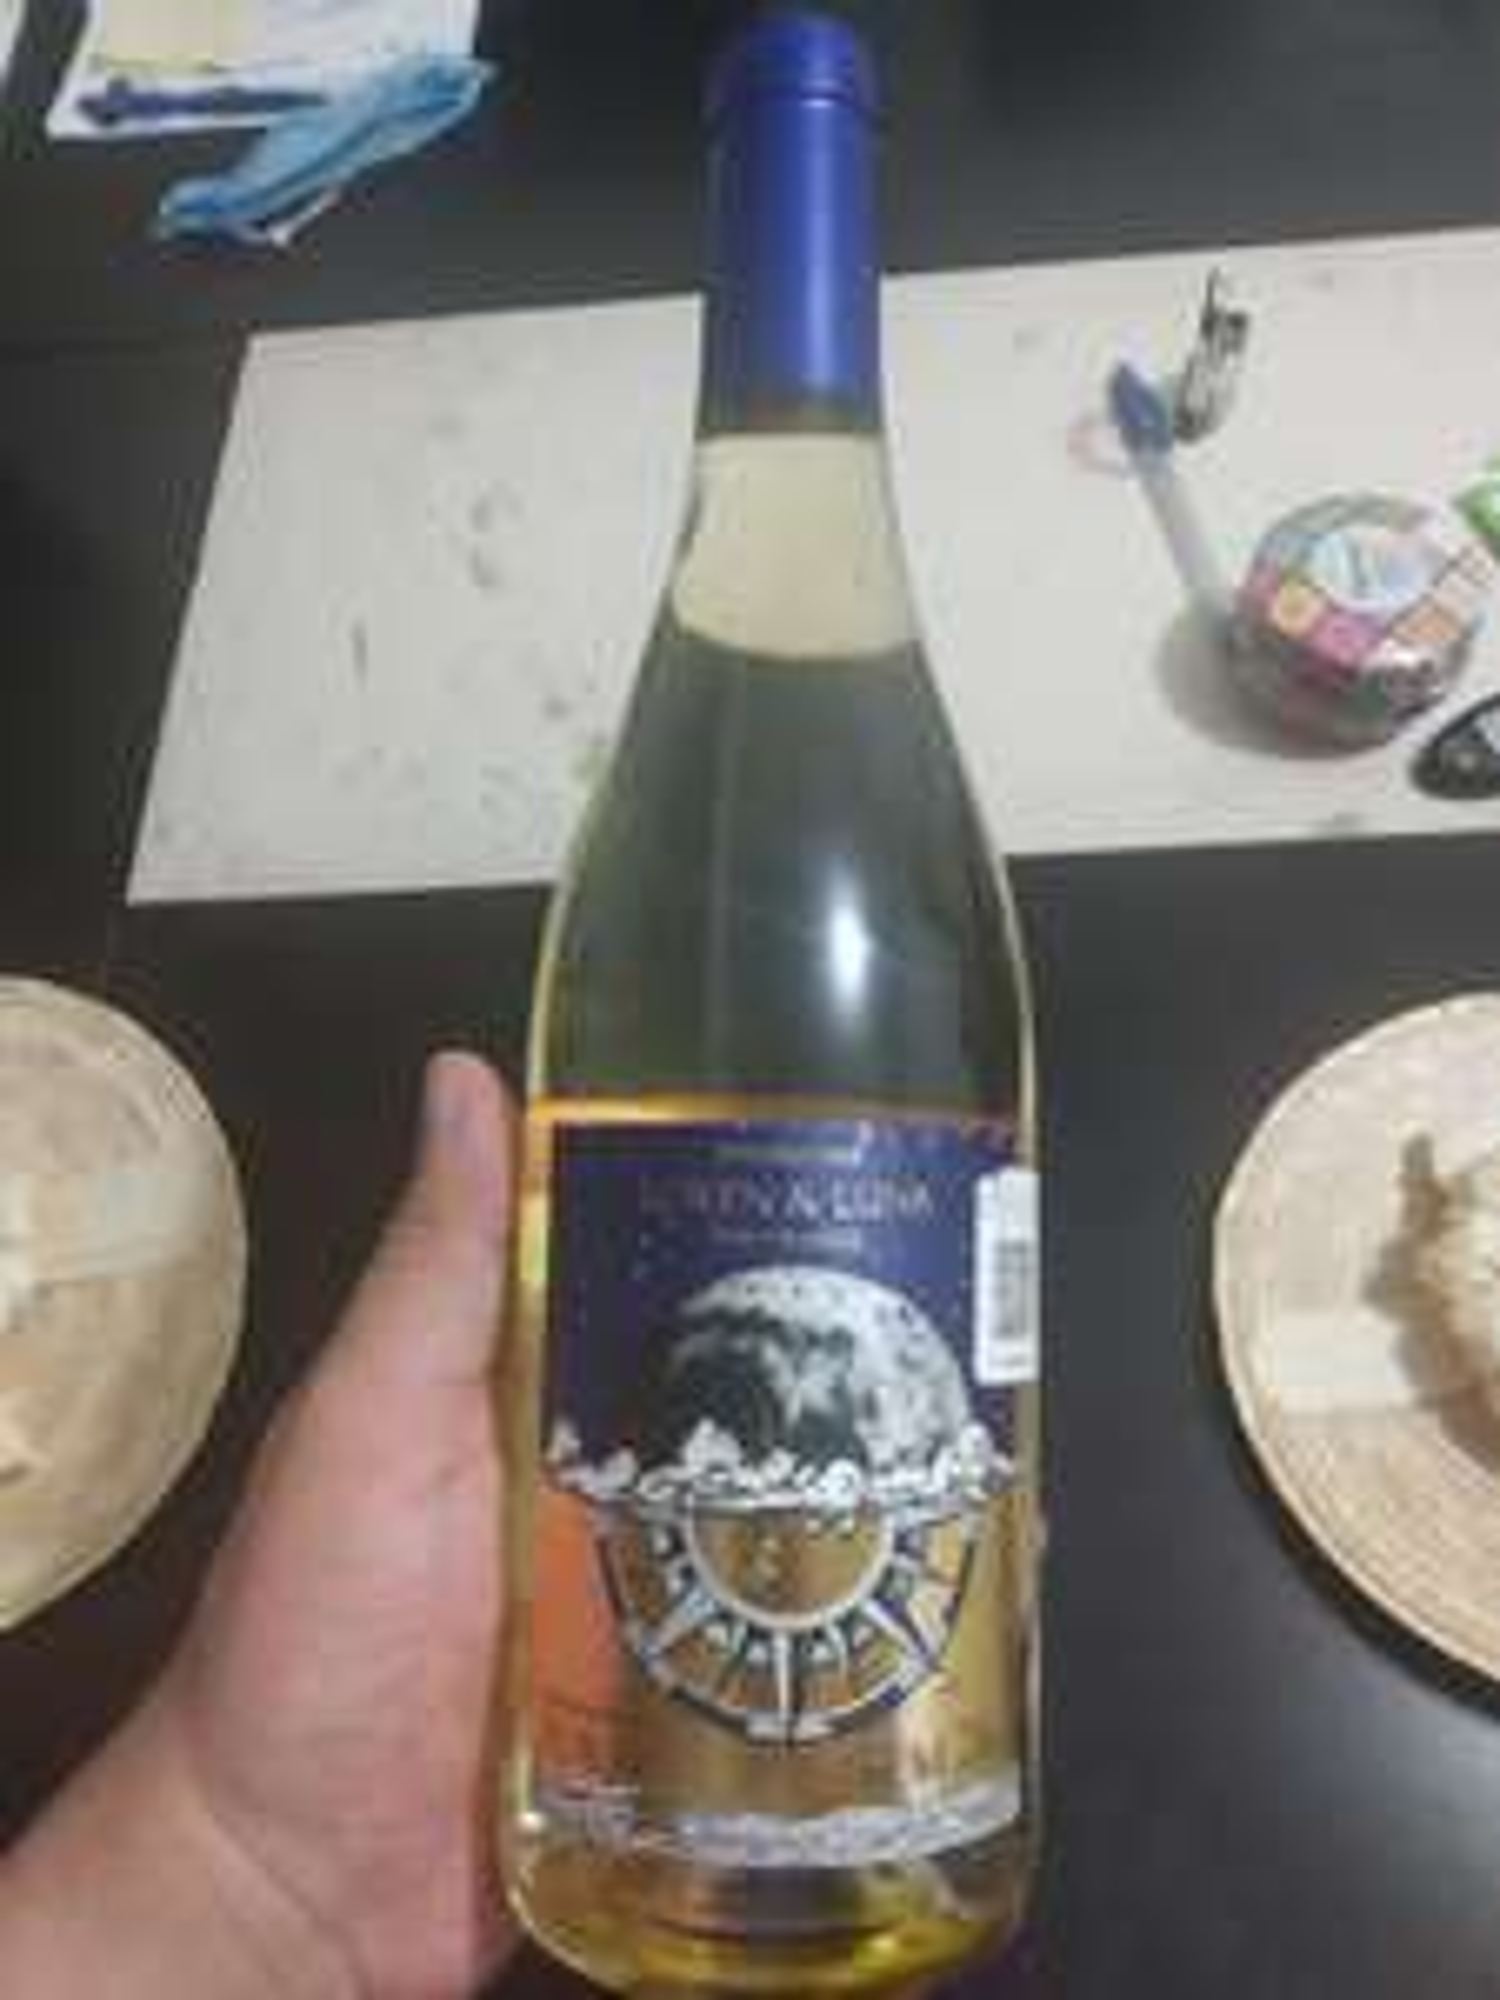 Sam's Club Vino blanco loren y luna